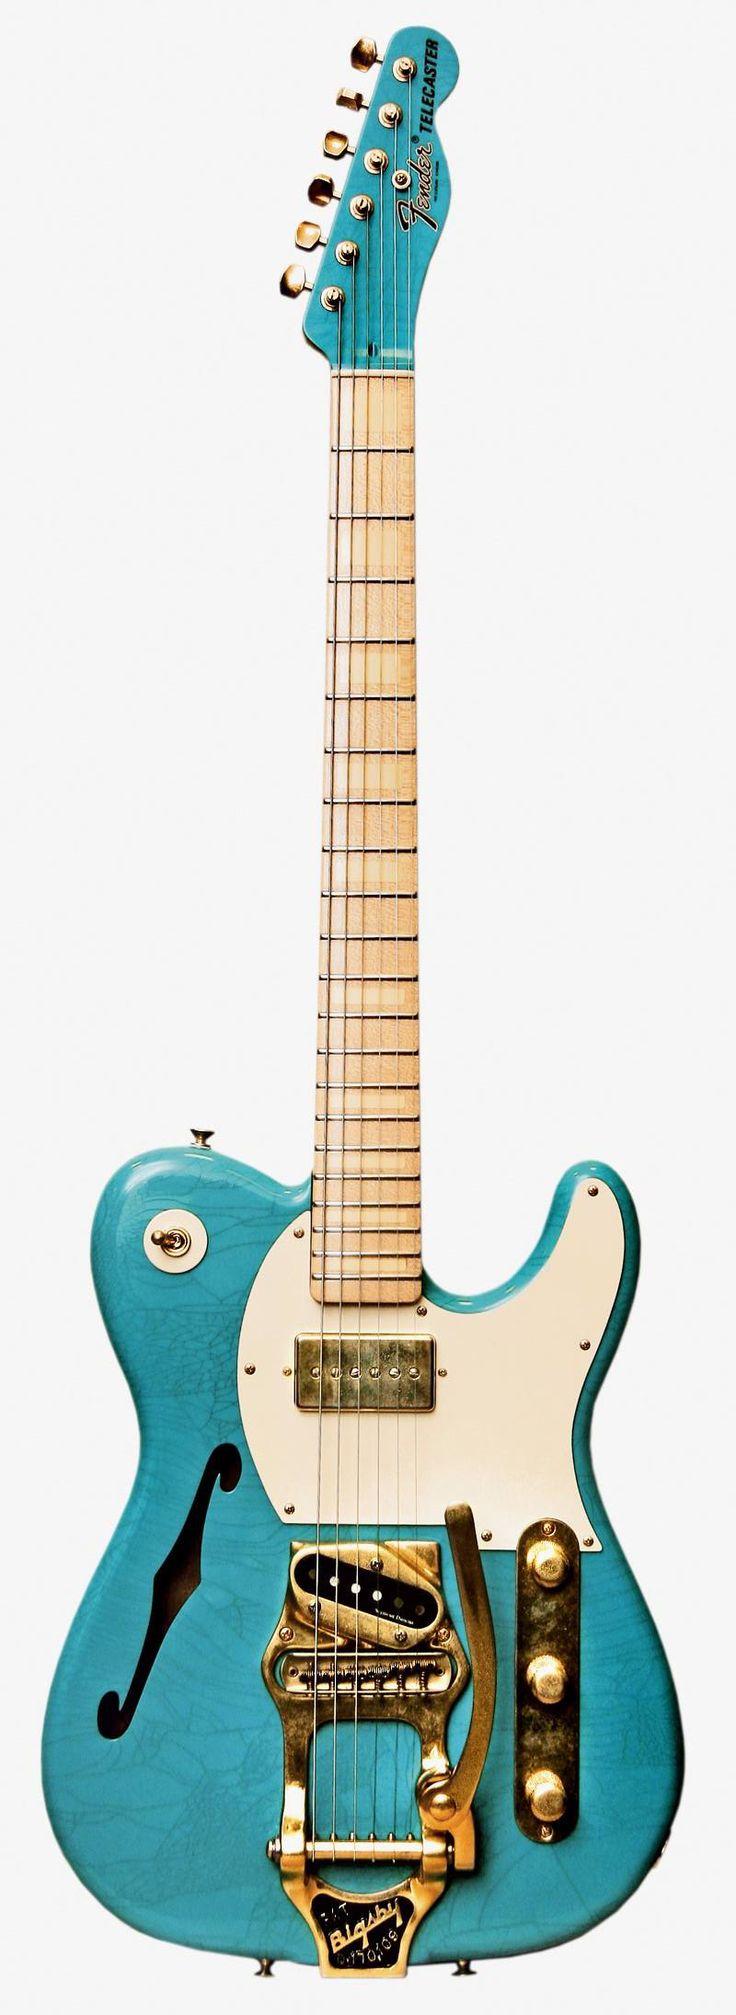 Custom Fender Linxy #Telecaster quite possibly the most beautiful Telecaster ever made. I dare say maybe even one of the most alluring objects of any kind that I've seen yet, for that matter.   ﷽ کڪګڬڭڮگڰڱڲڳڴ؇؇؆؈؏ؑؓ٘ڠ؟ۼؤئݲةّ٘ٚ٣٭ۜ۞ٌّّ ݰݯݱﭼﱇﱇﱑﱒﱔﰡﰠﰴﰳ*ﱞﱎﱸﱷﲂﲴﳀدﳐدهﶊﶊهﶊﶺ﷽ﷲﻄﻈૐ  ::::ﷻ☝️ ♔ﷲ ﷳ❥♡ ﷺ ﷴ ﷵ ♤✤❦♡ ۩ ✿⊱╮☼﷼ ☾ ﮪ؏ ♔❥♡ अमिताभ♤ ✿⊱╮☼ ☾PINTEREST.COM christiancross ☀ قطـﮧ ⁂⥾   ﷳ❥  ◐ ⦿ ⥾ ❤❥◐ •♥•*⦿[†] ☪﷽ ::::